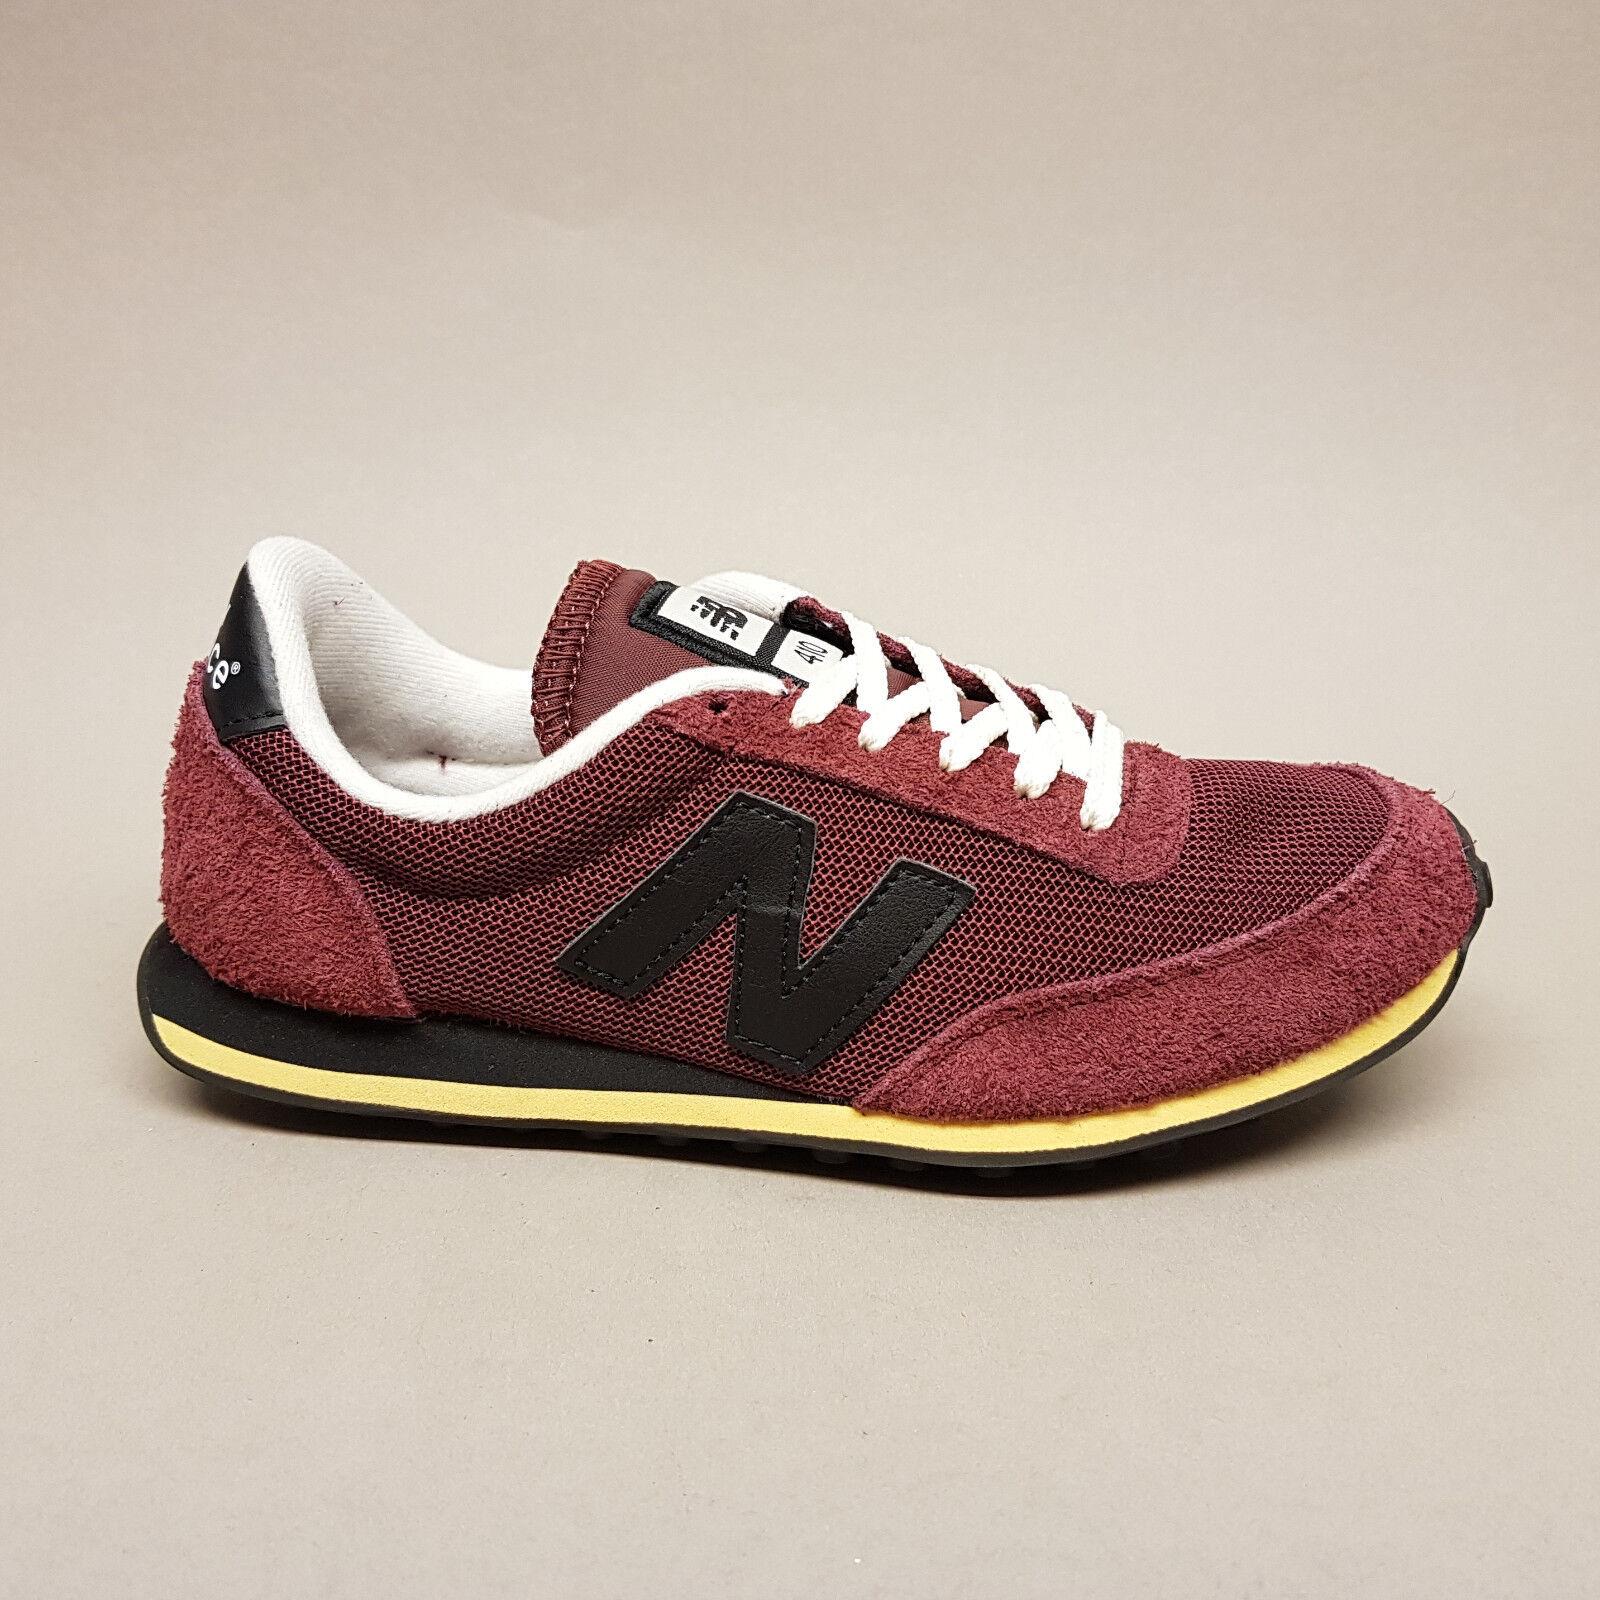 New Balance Classics U410VRK Burgundy Turnschuhe Sneaker rot  36   37   42  42,5